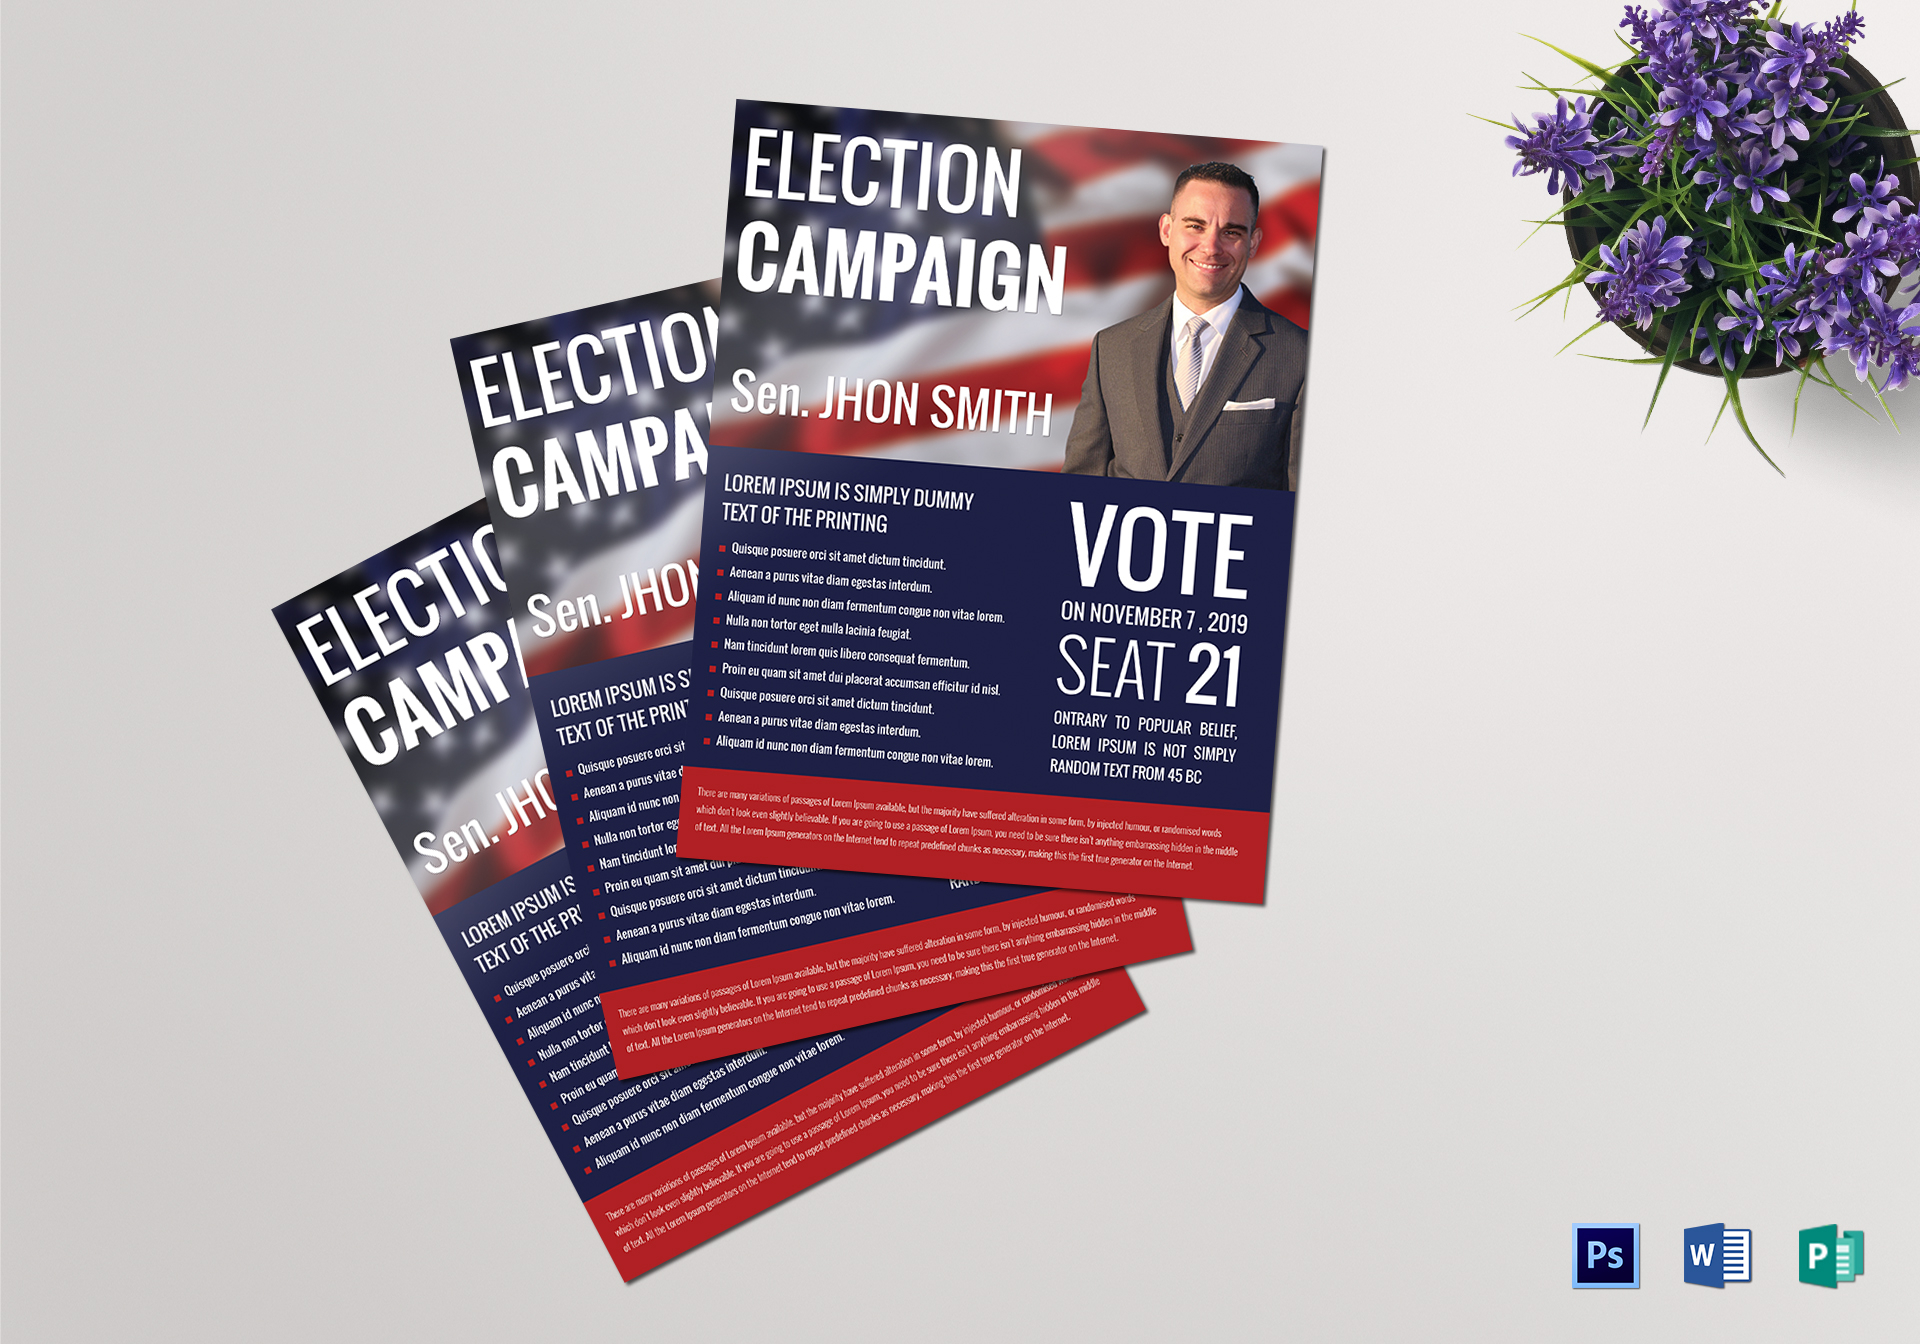 political campaign flyer design template in word psd publisher. Black Bedroom Furniture Sets. Home Design Ideas